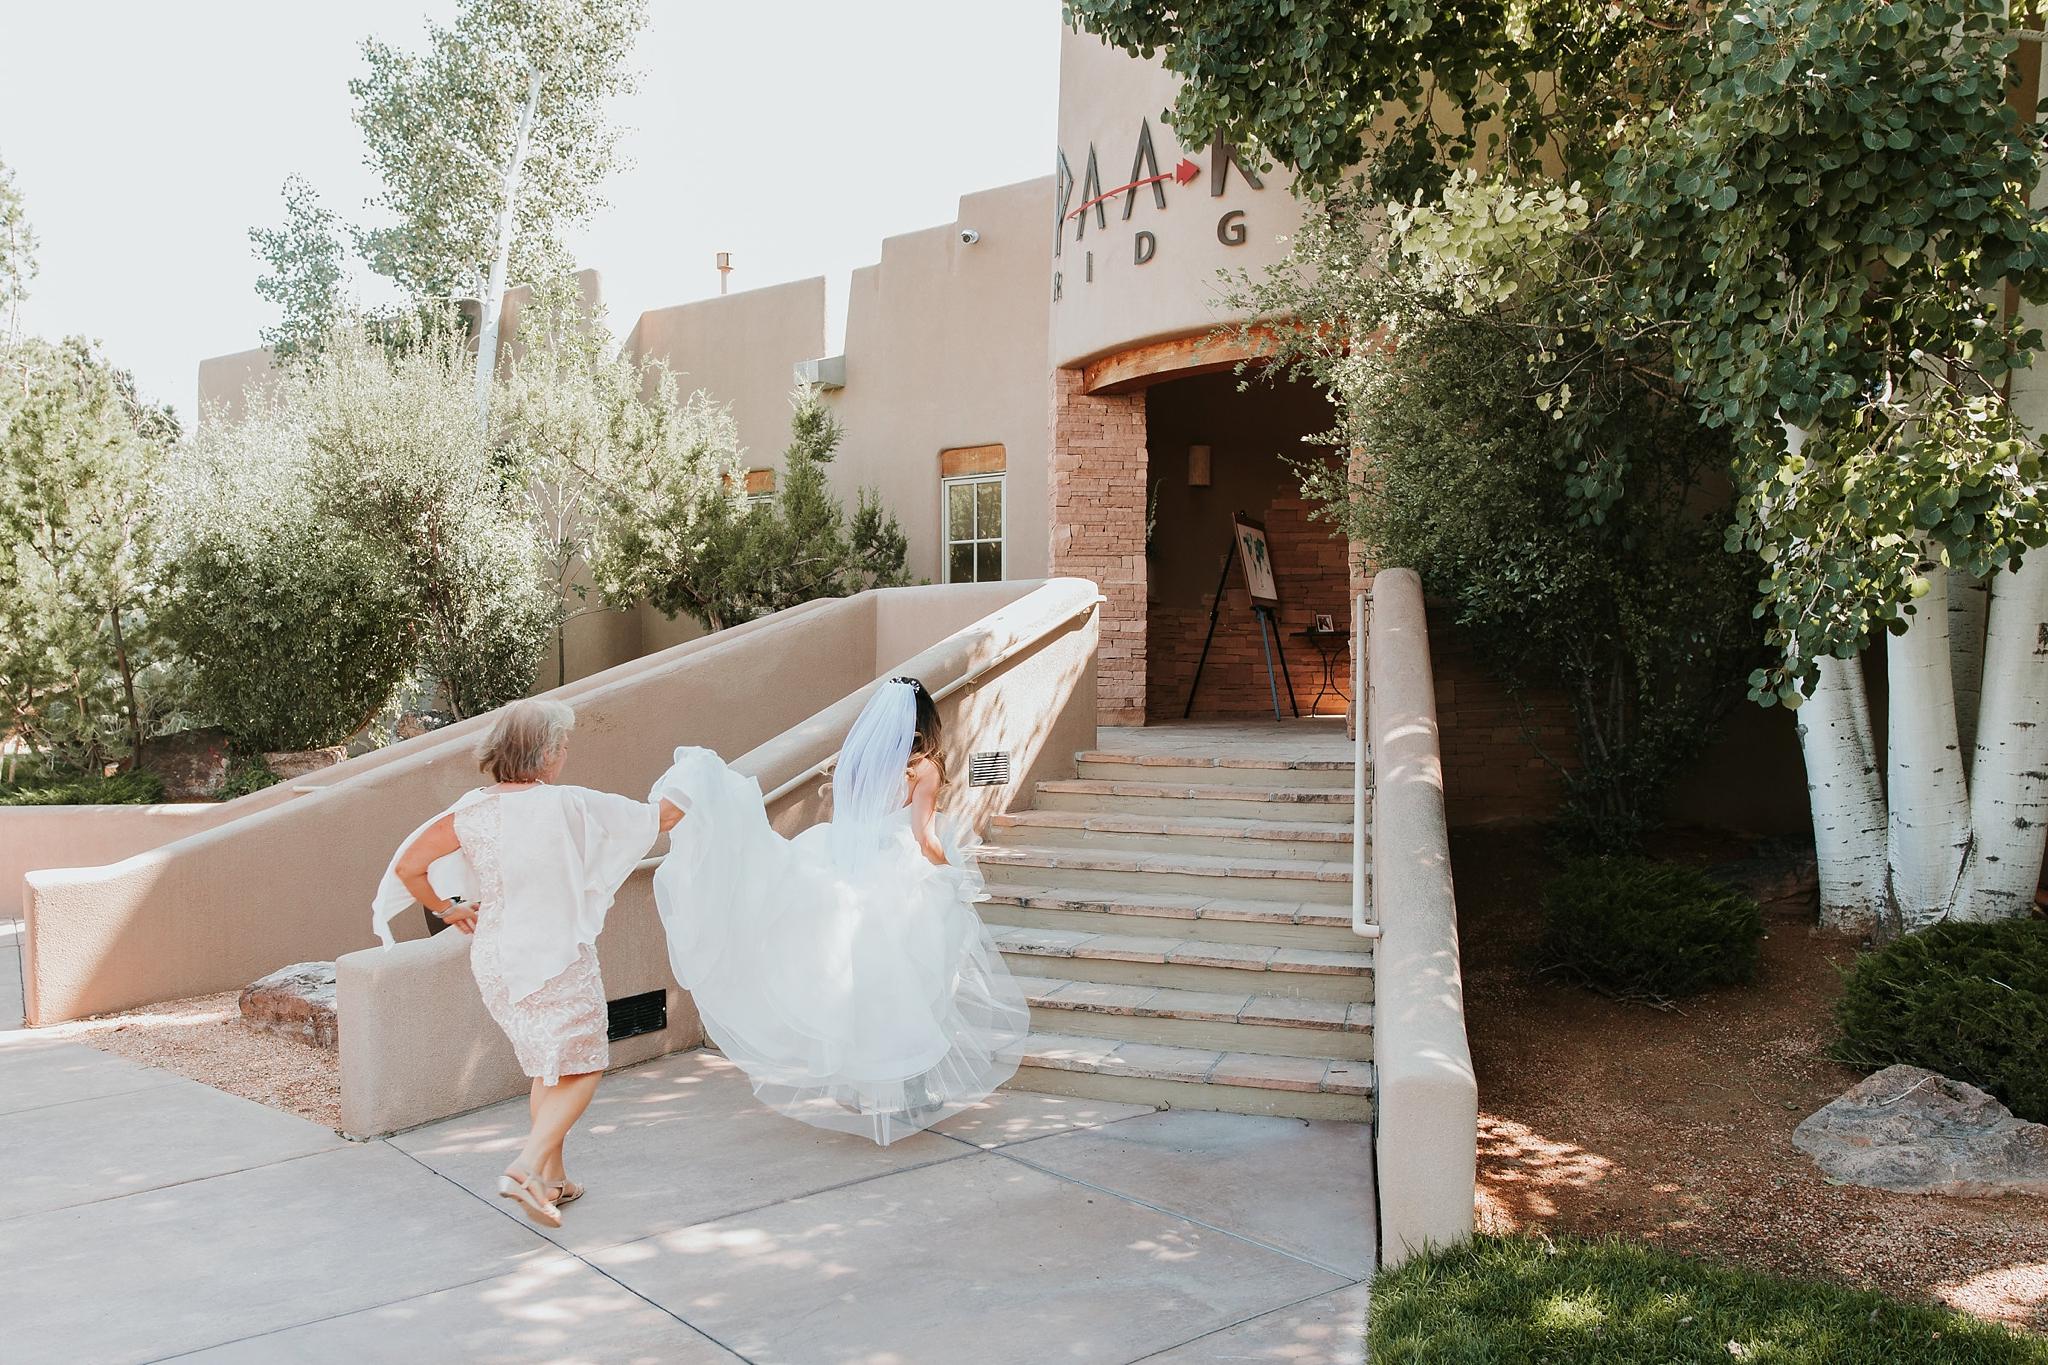 Alicia+lucia+photography+-+albuquerque+wedding+photographer+-+santa+fe+wedding+photography+-+new+mexico+wedding+photographer+-+new+mexico+wedding+-+family+photographer+-+mothers+day+-+mother+of+the+bride_0038.jpg